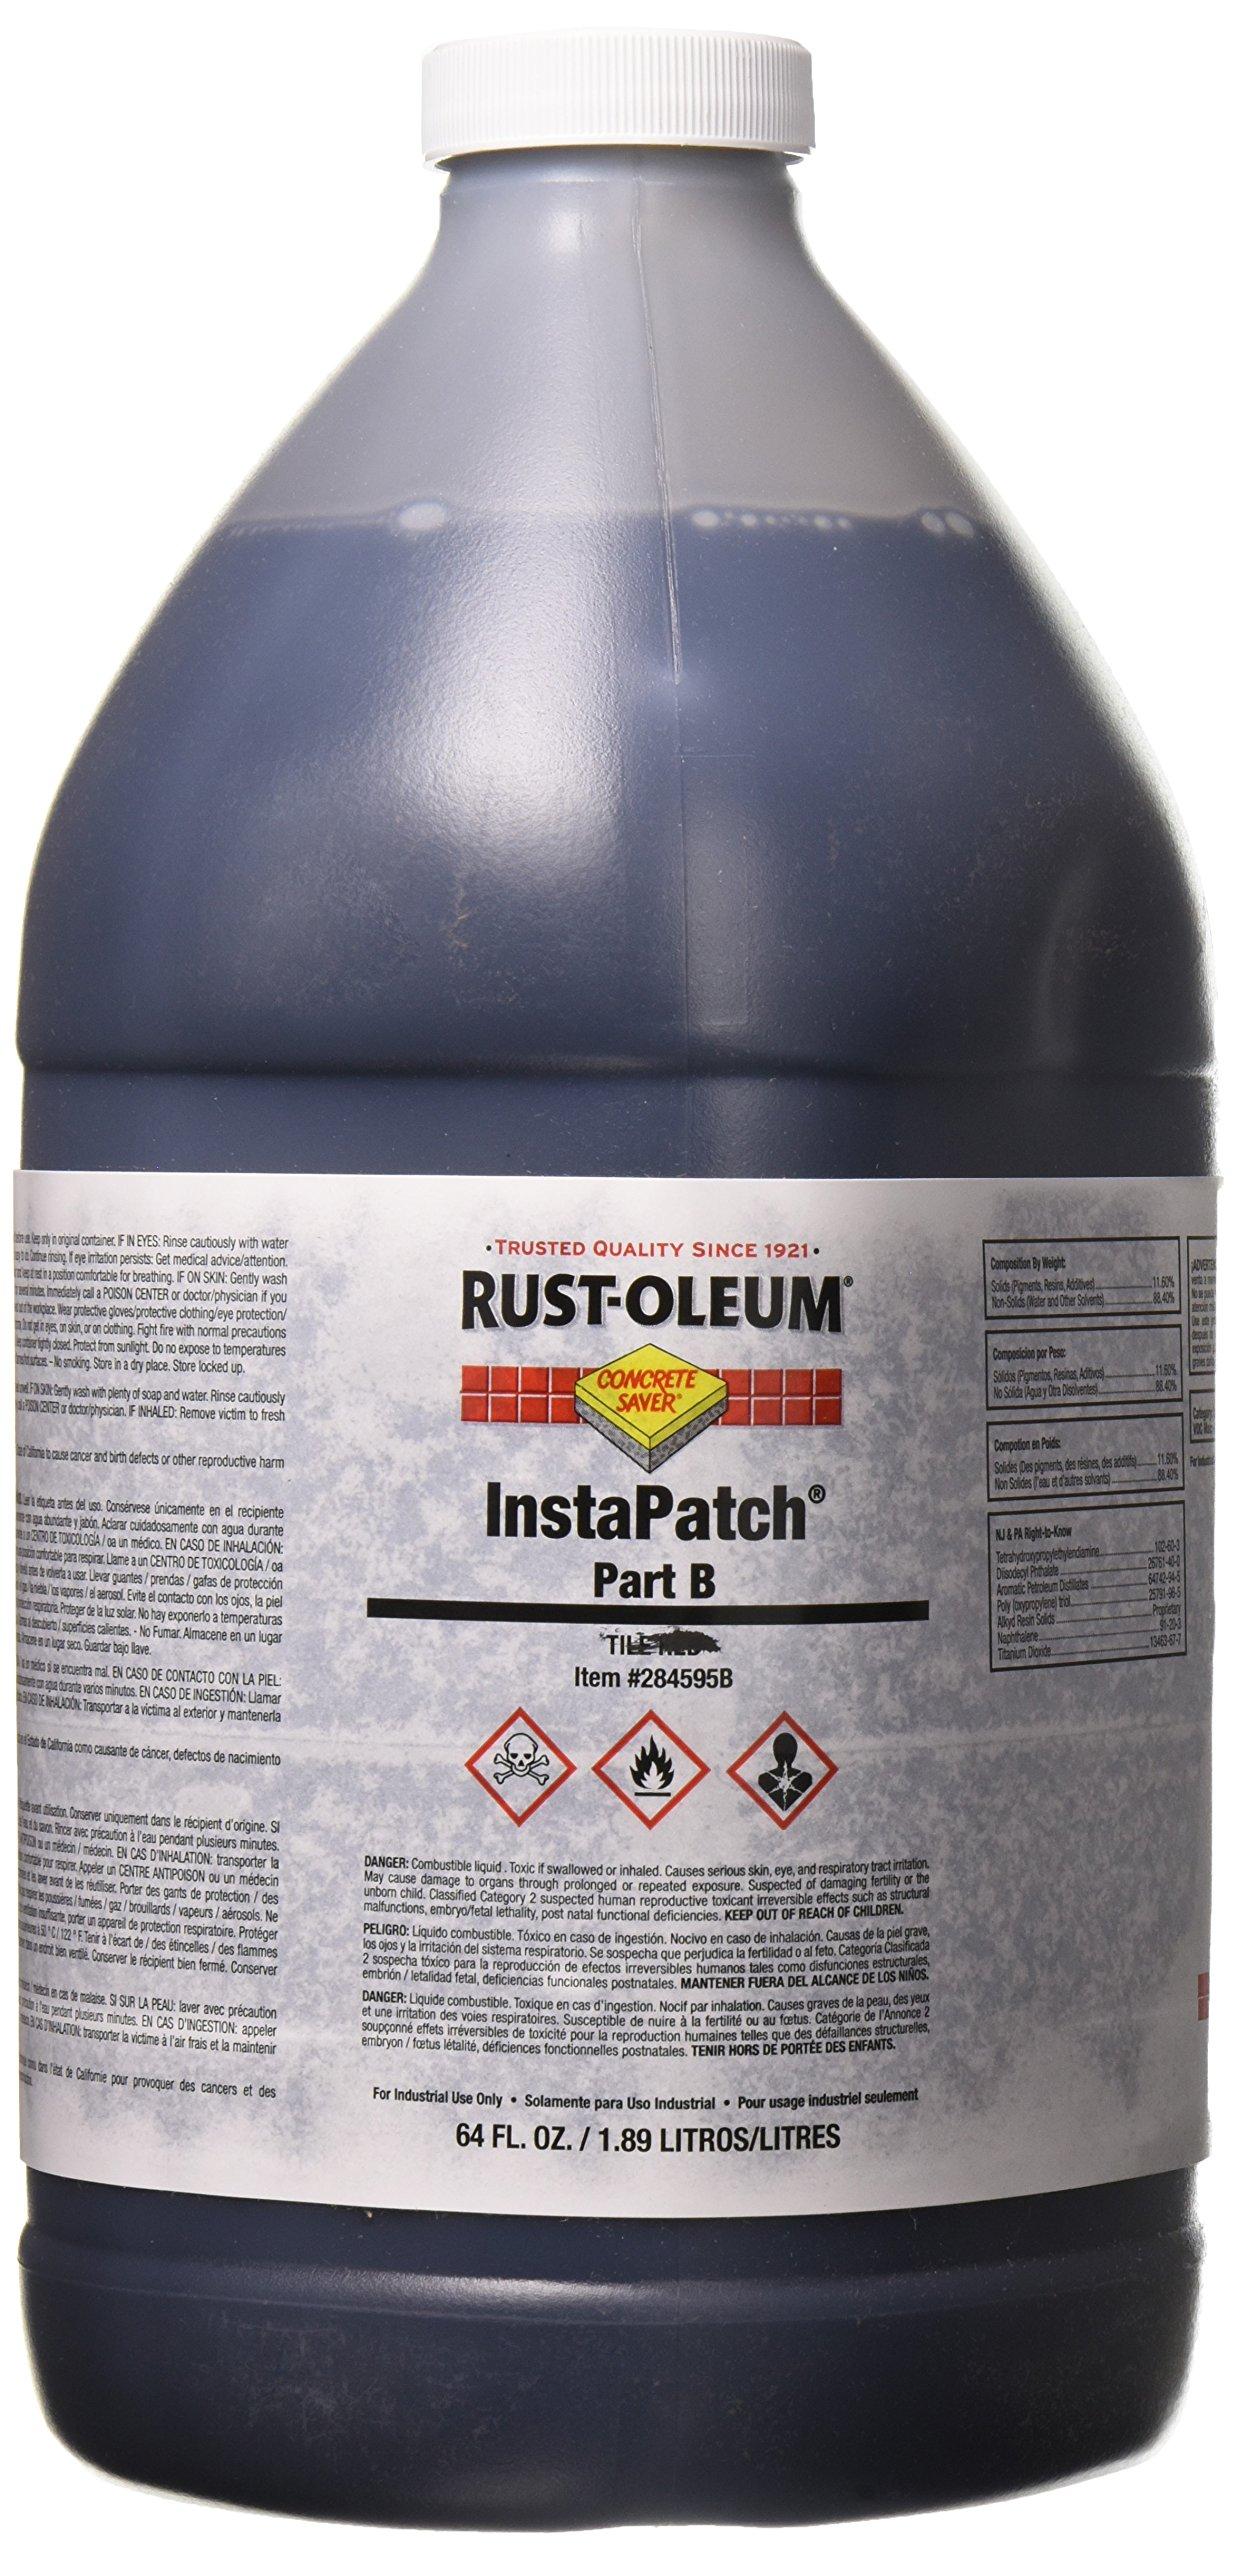 Rustoleum GIDDS-1031010 Rustoleum Instapatch Concrete Repair, 1 Gallon Kit